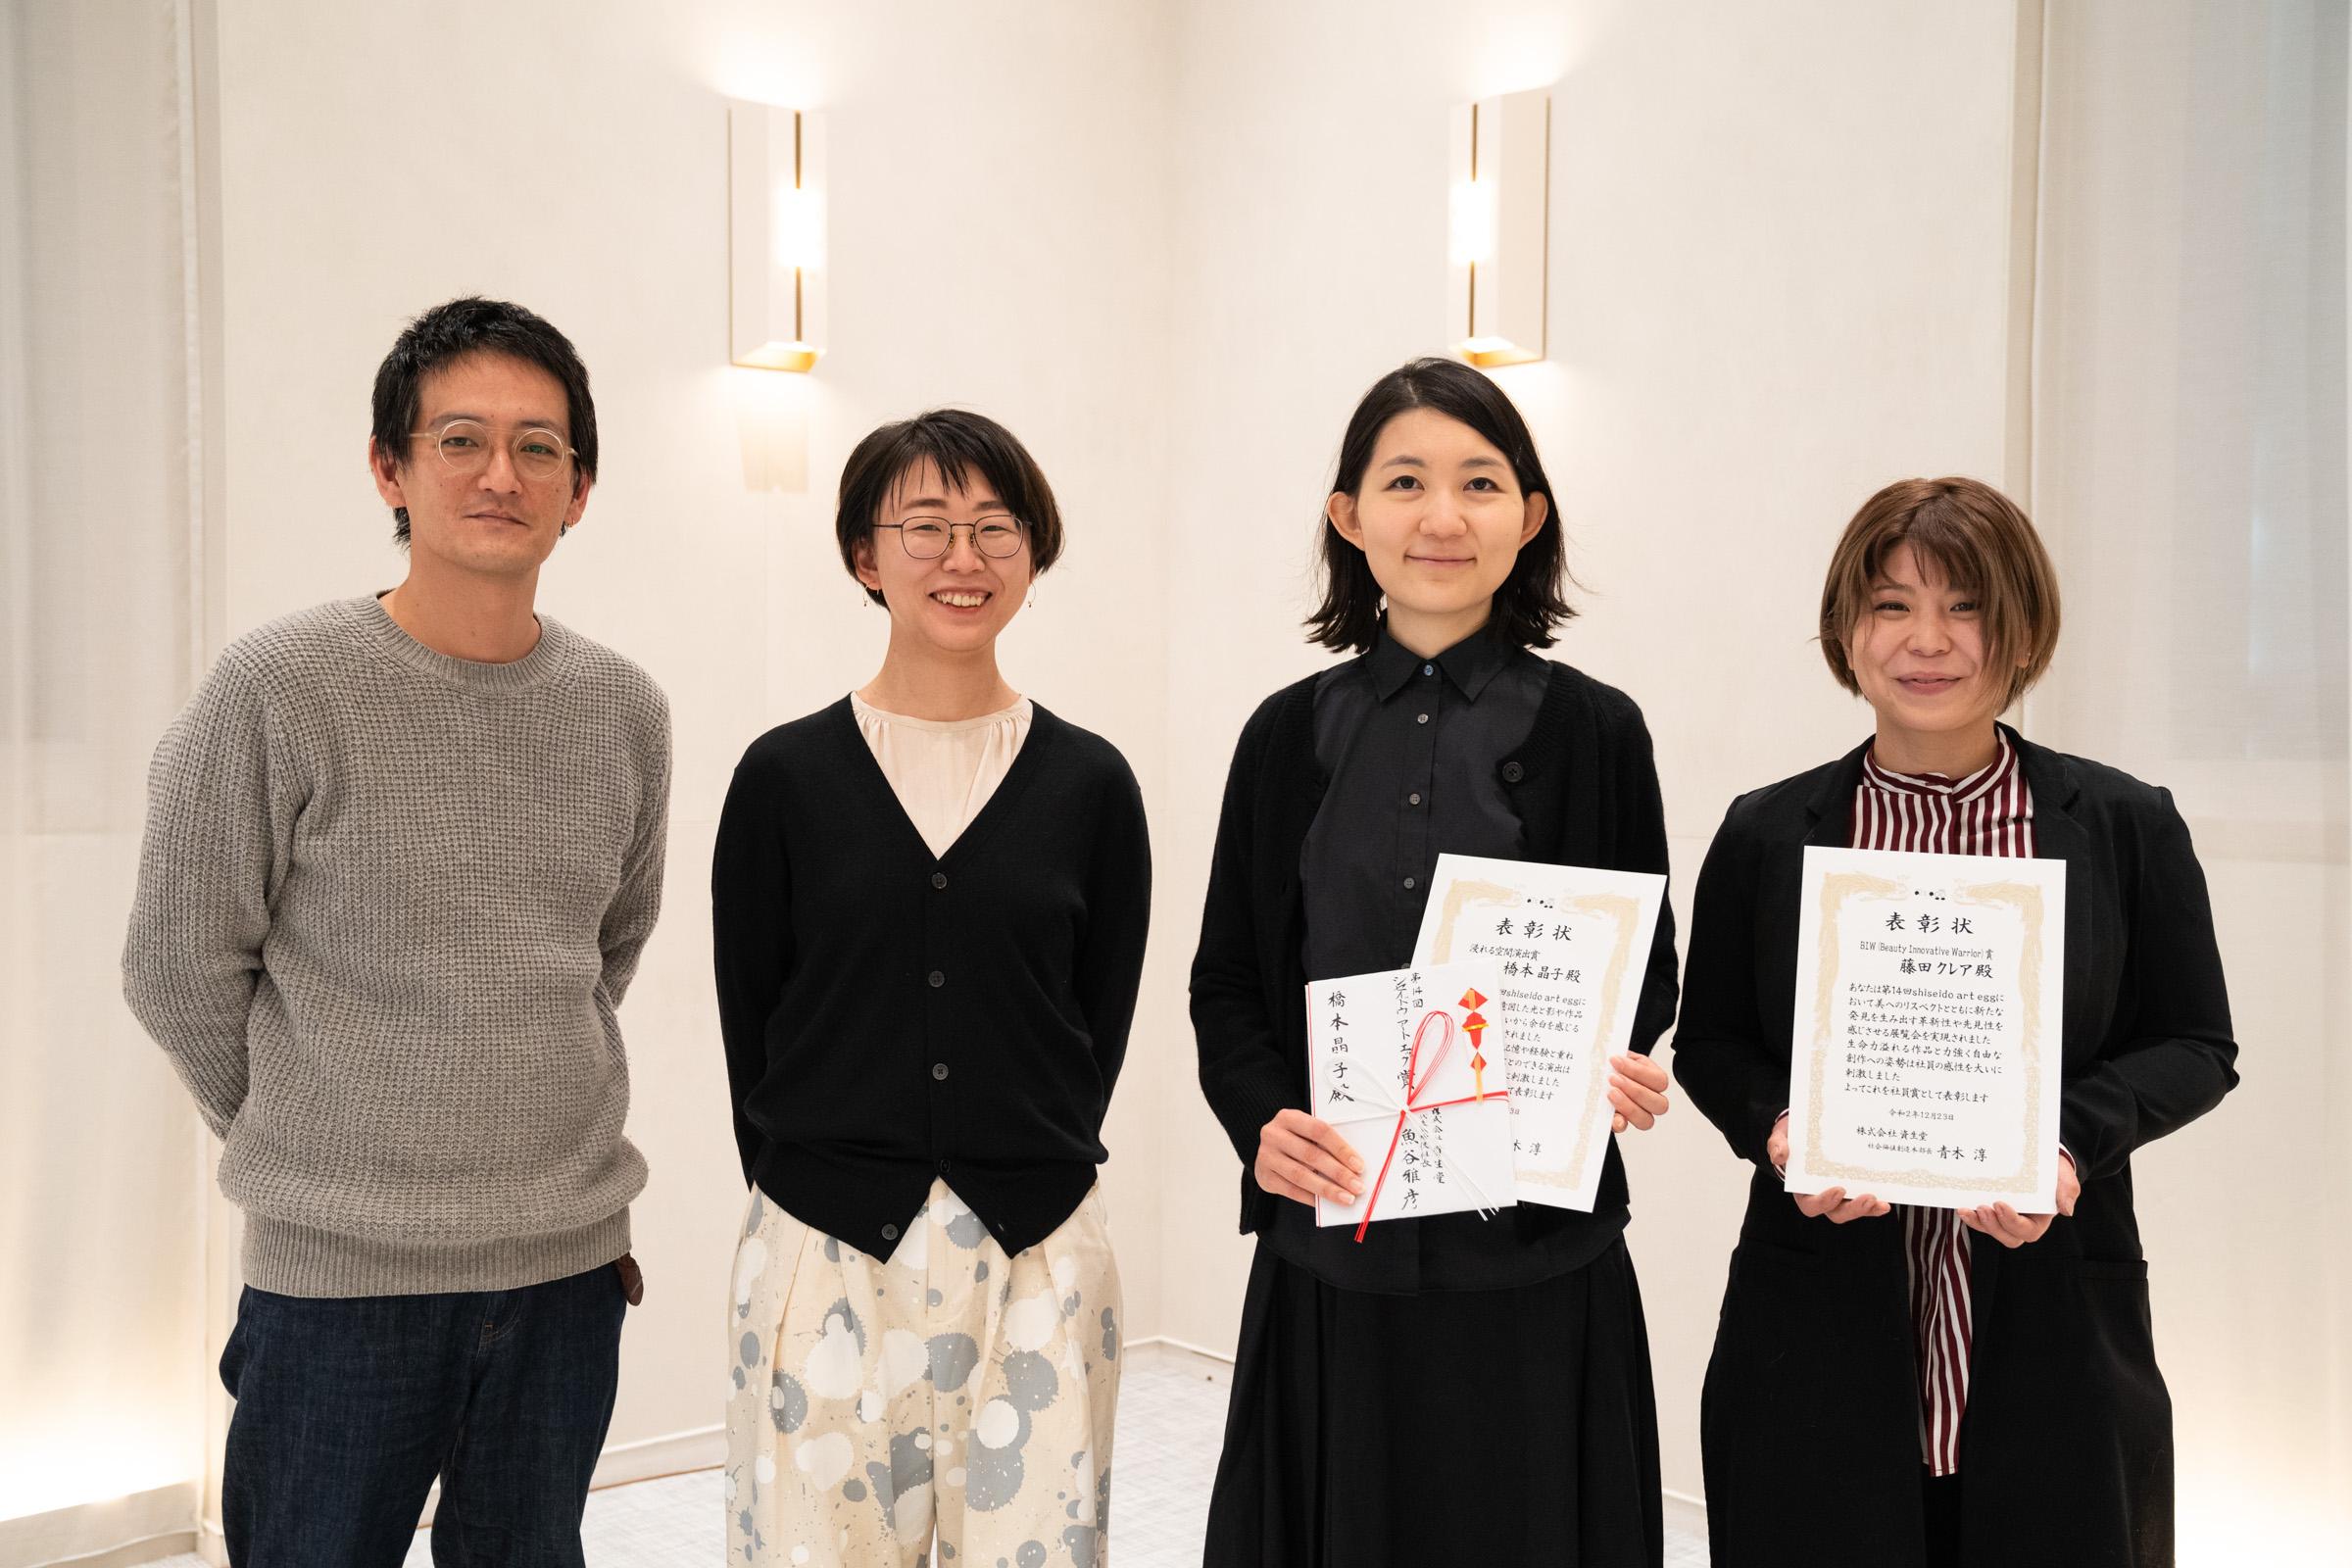 「第14回shiseido art egg賞」授賞式の様子。左から 今井氏、大崎氏、橋本氏、藤田氏